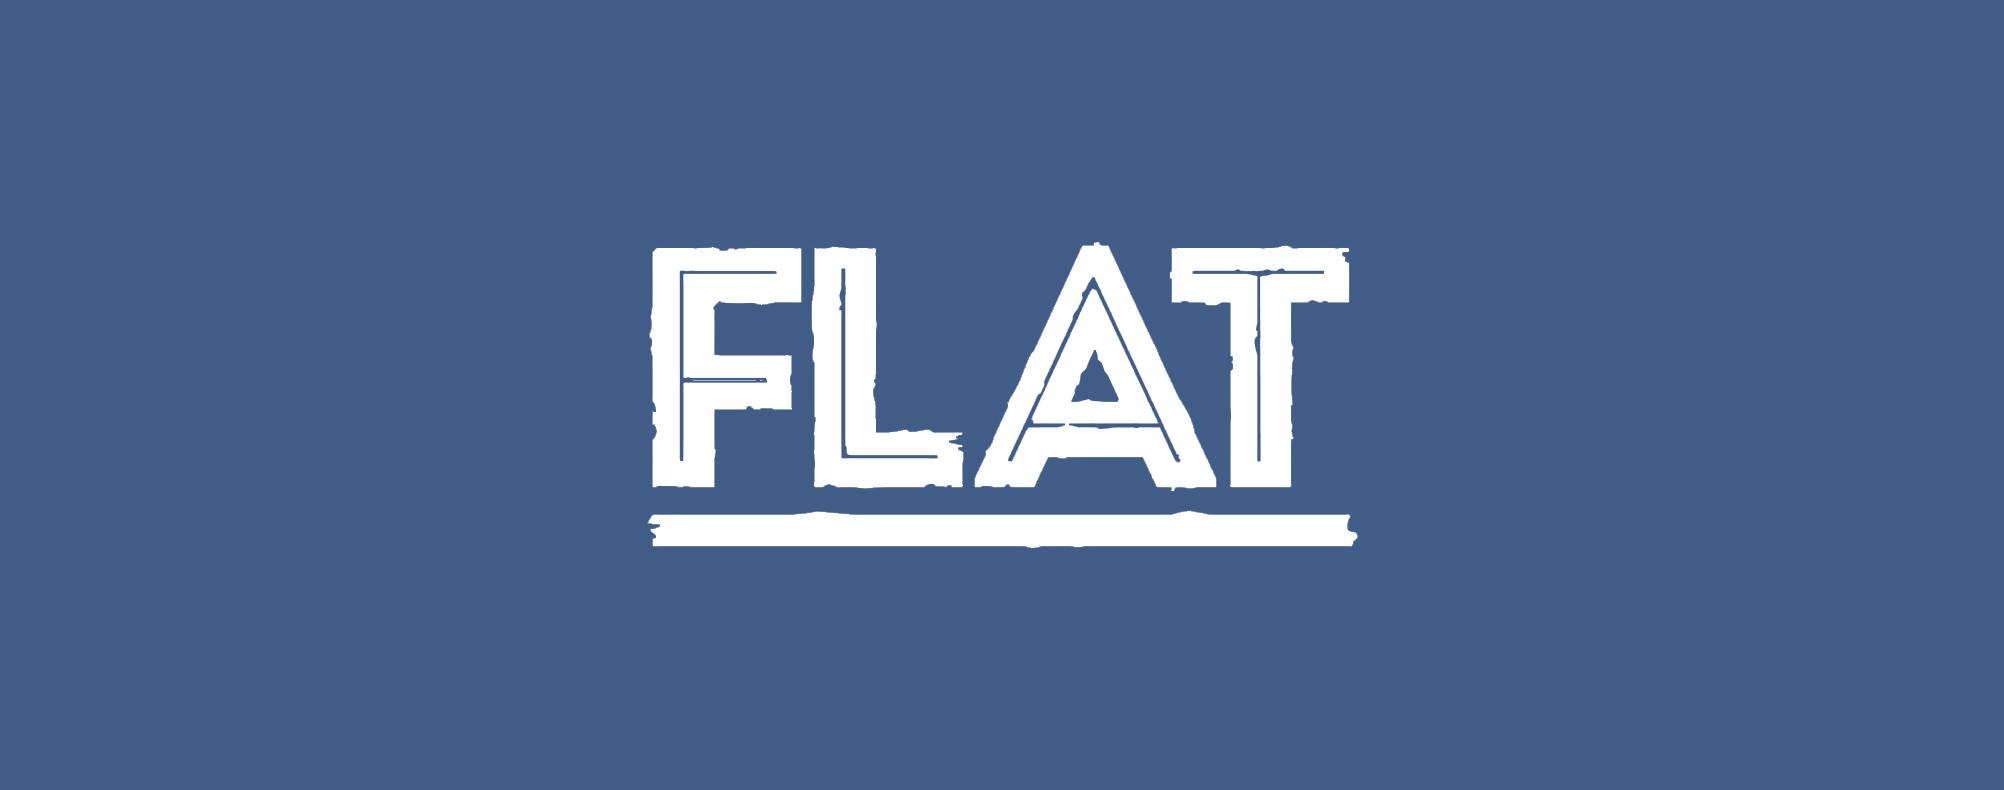 Арт-студия FLAT